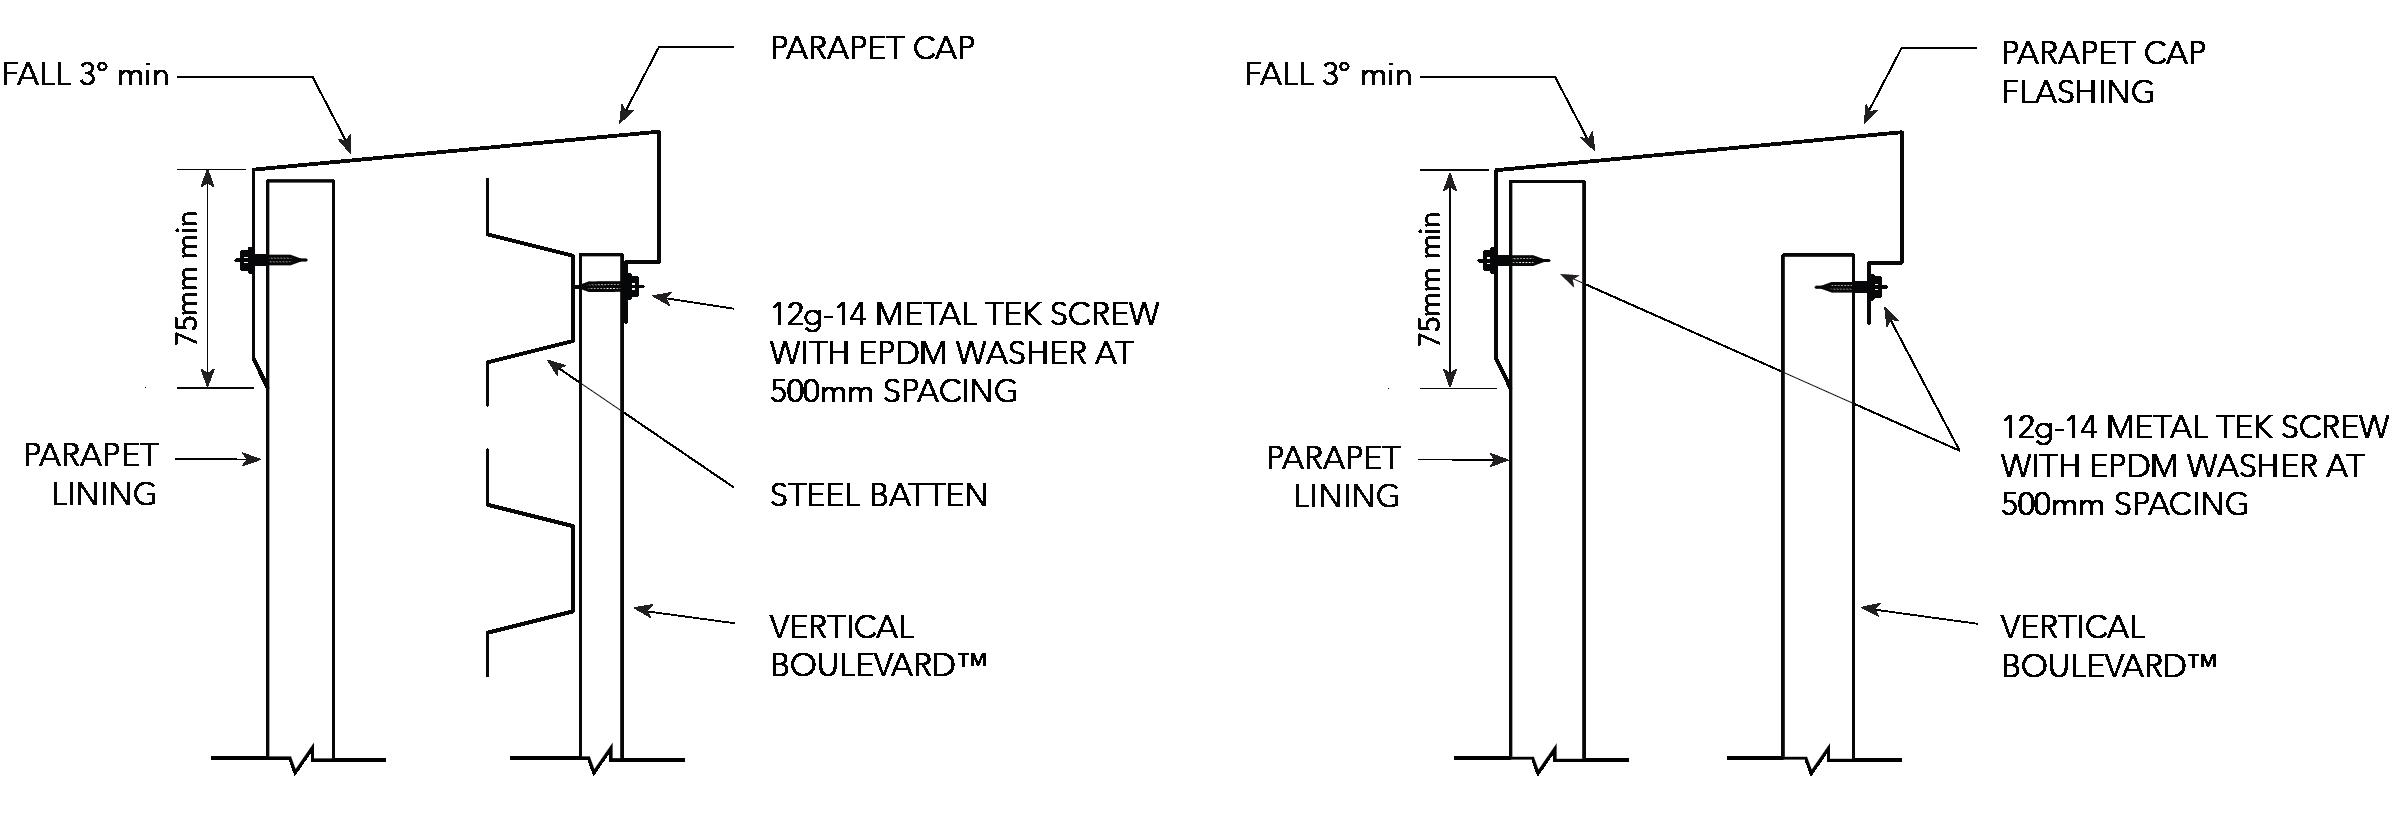 BOULEVARD™ NON-CYCLONIC Top of Facade/Parapet - Vertical Figure BL ID NC 005